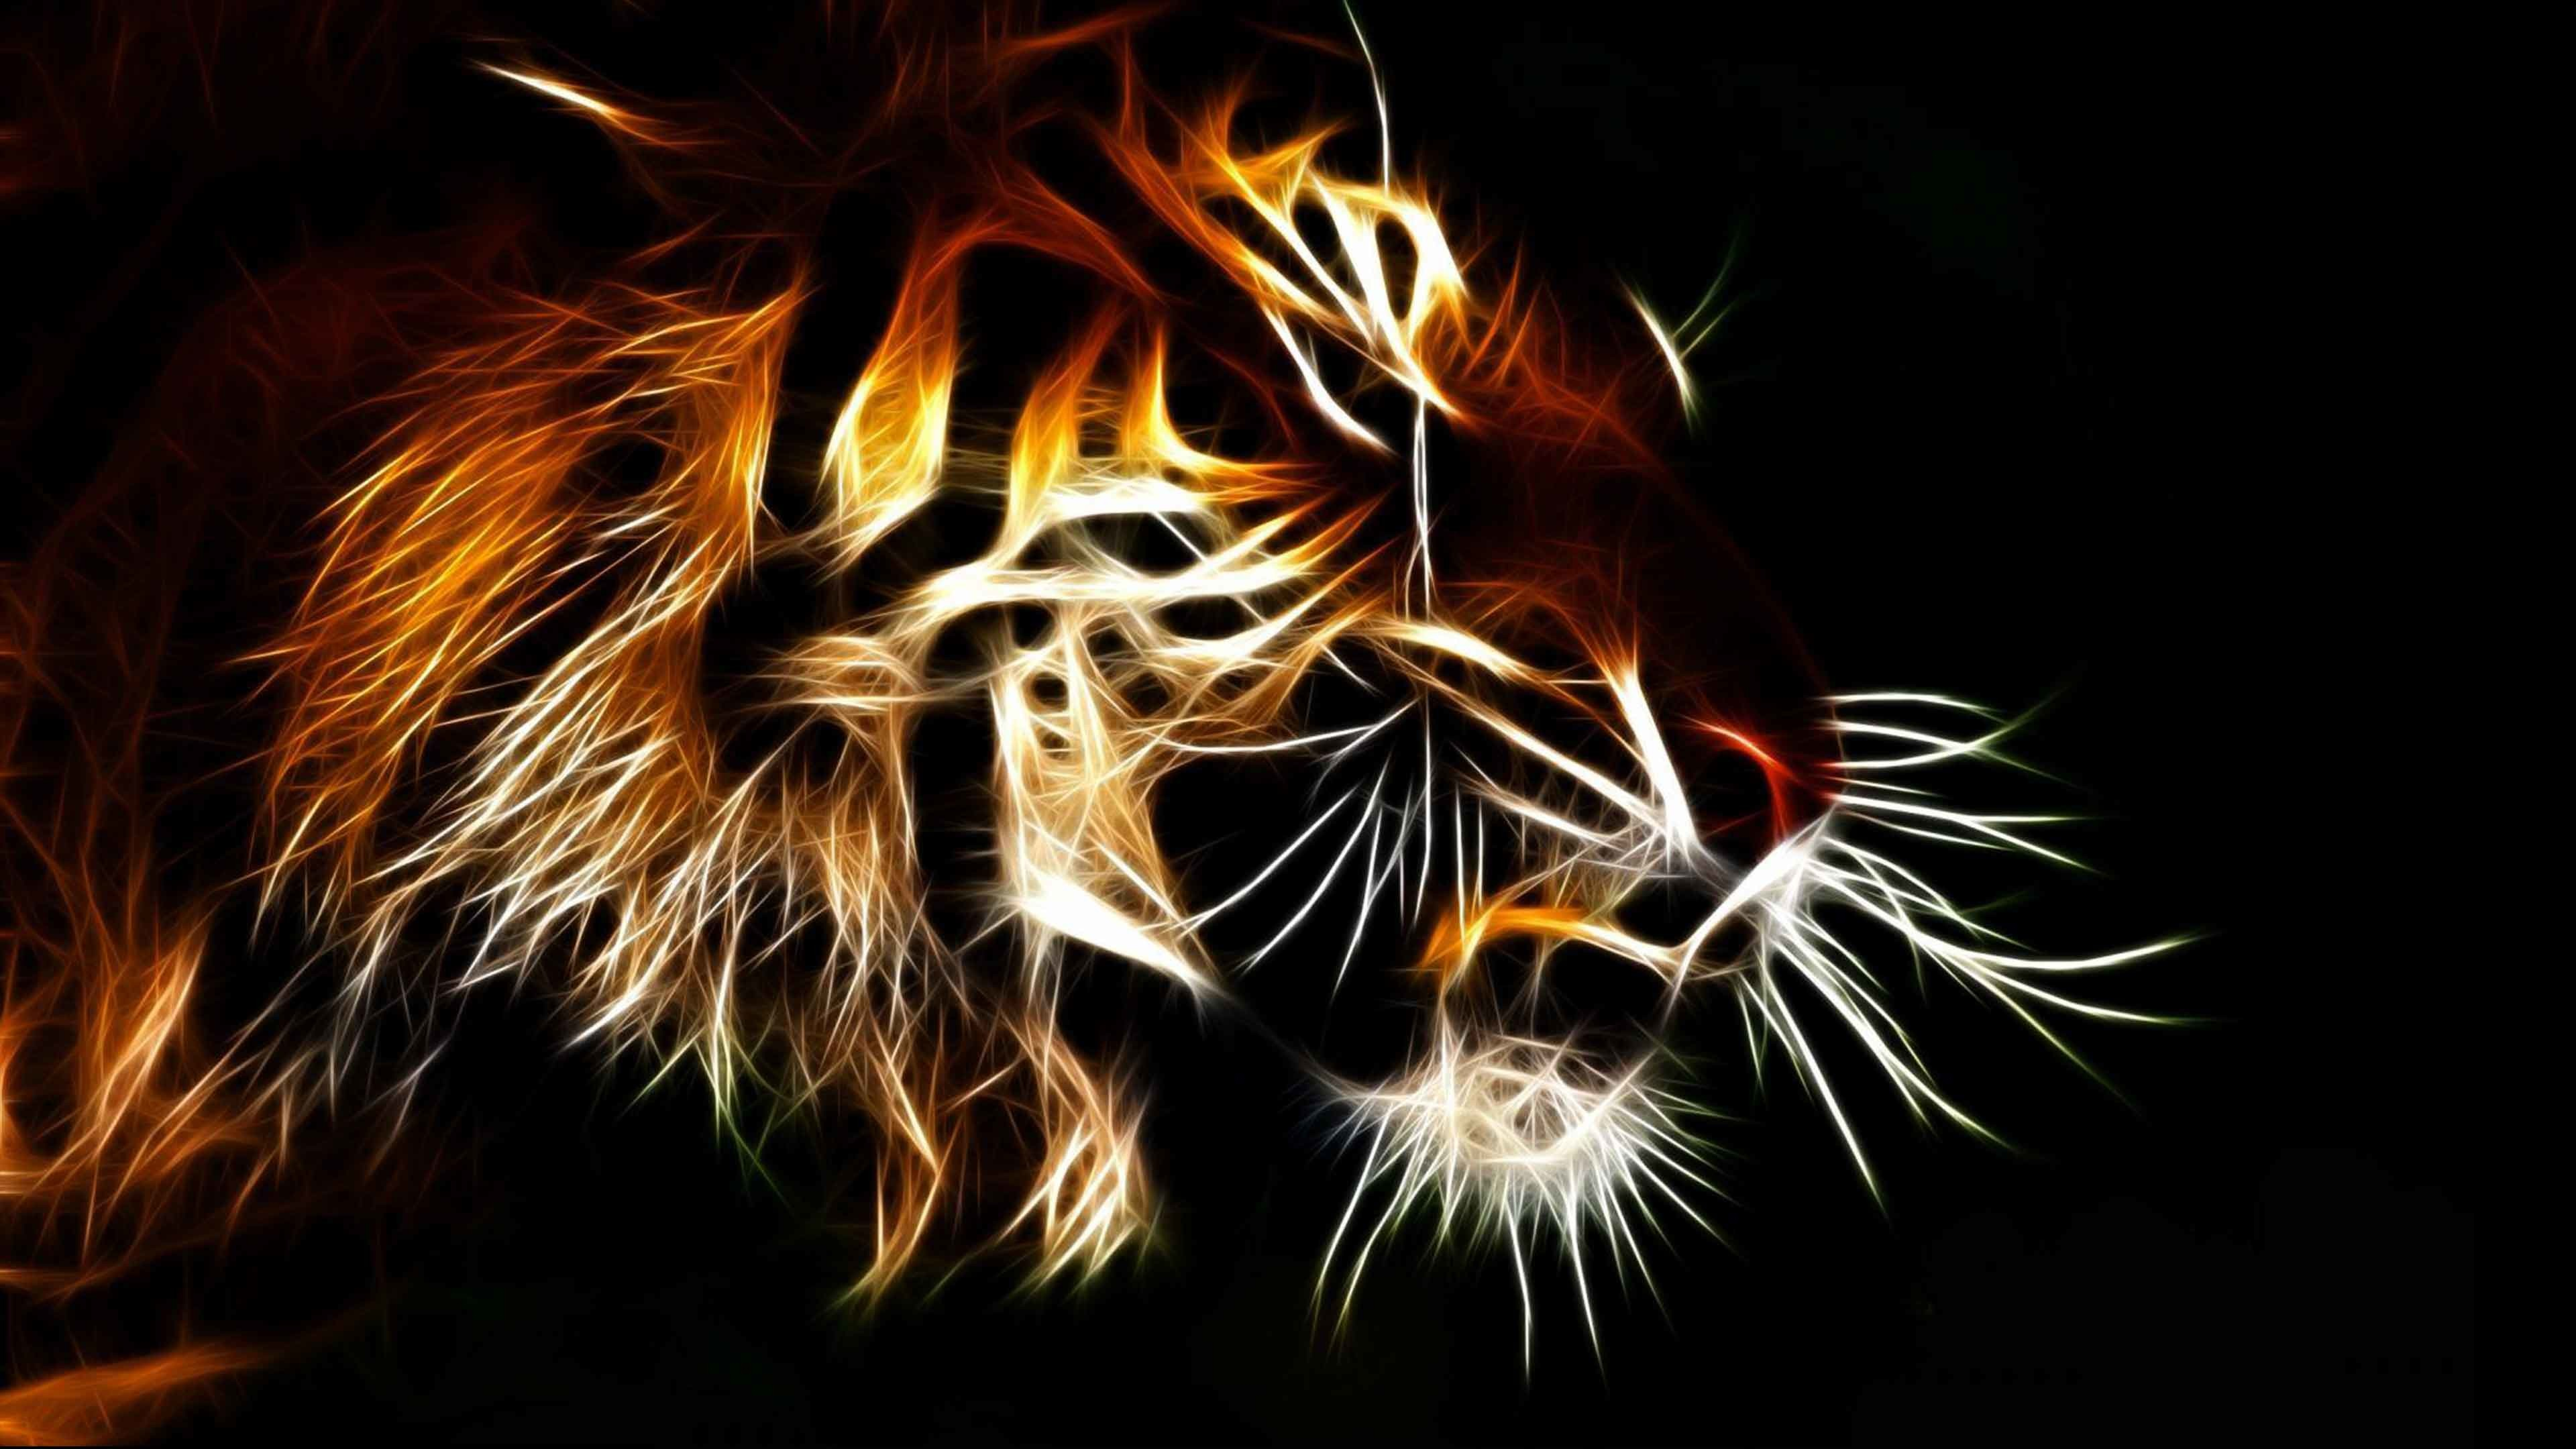 Animal Wallpaper Full Hd Animated Tiger Wallpaper 56 Images